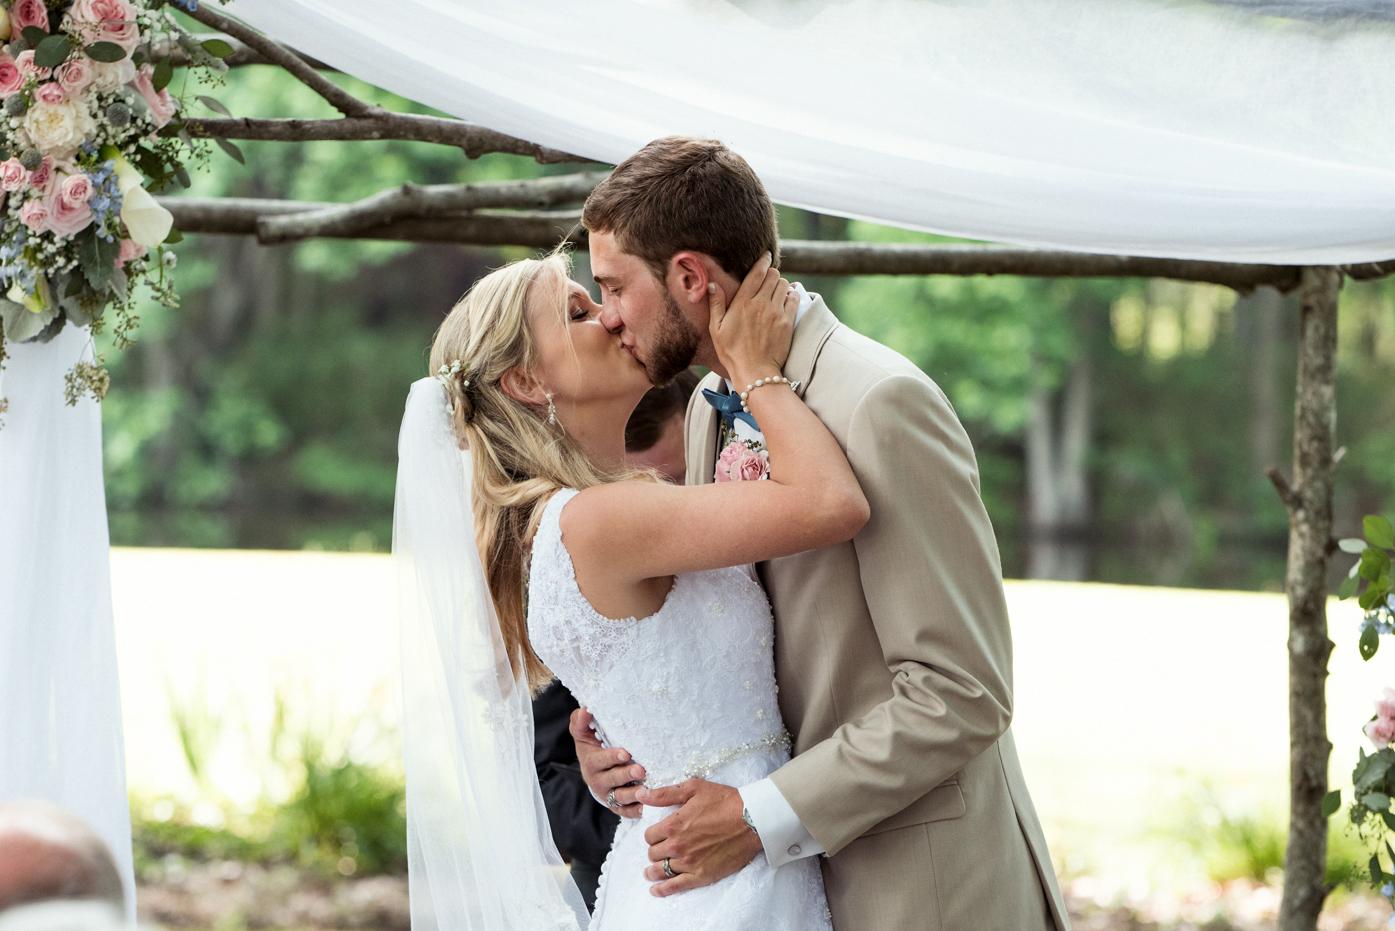 Wedding Photos from Tripp Farms in Greenville, North Carolina